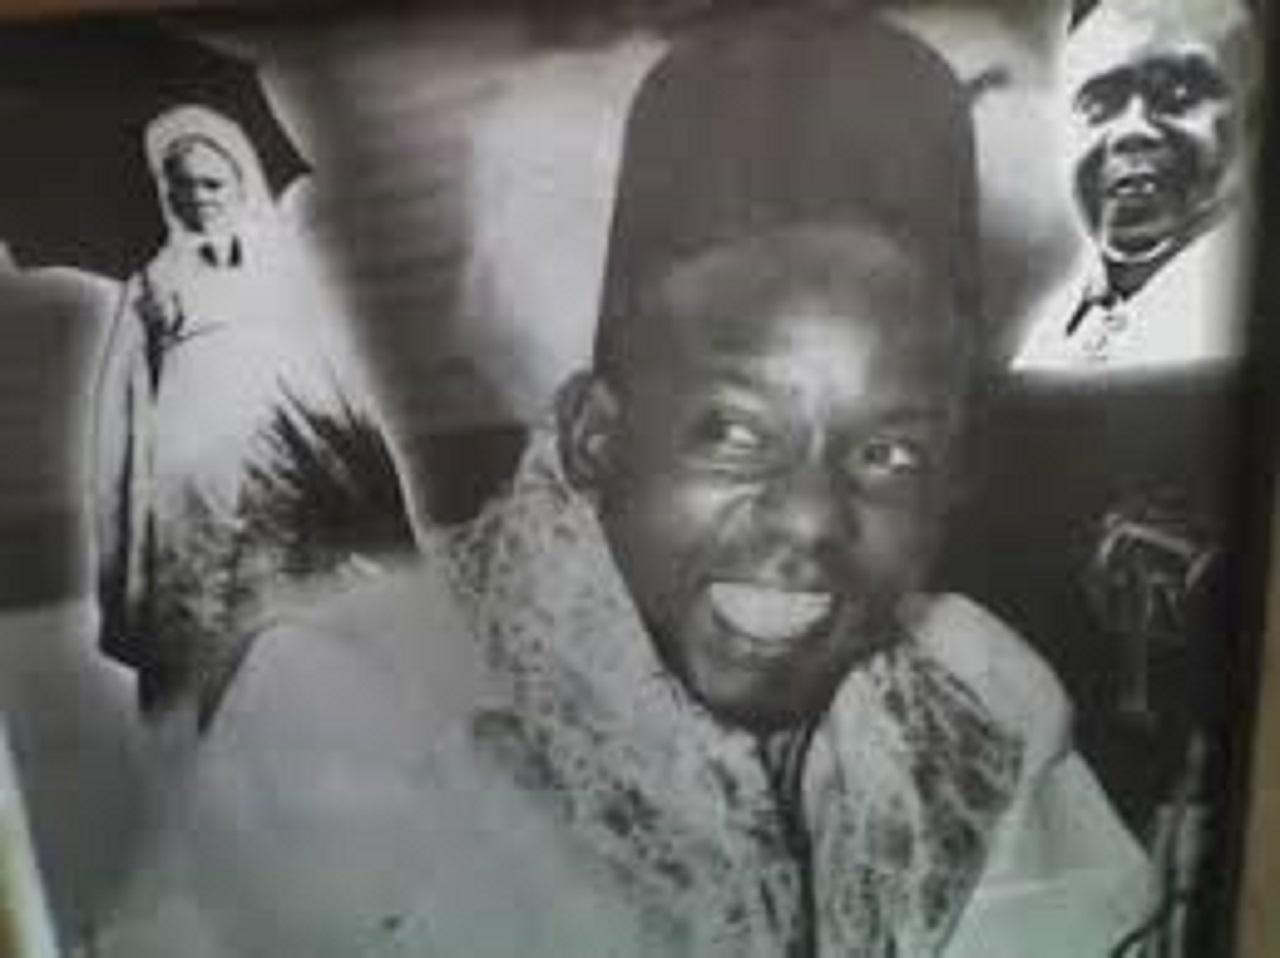 Takoussane: Djamiah SEYDI DJAMIL Fass, le 5 Janvier 2019